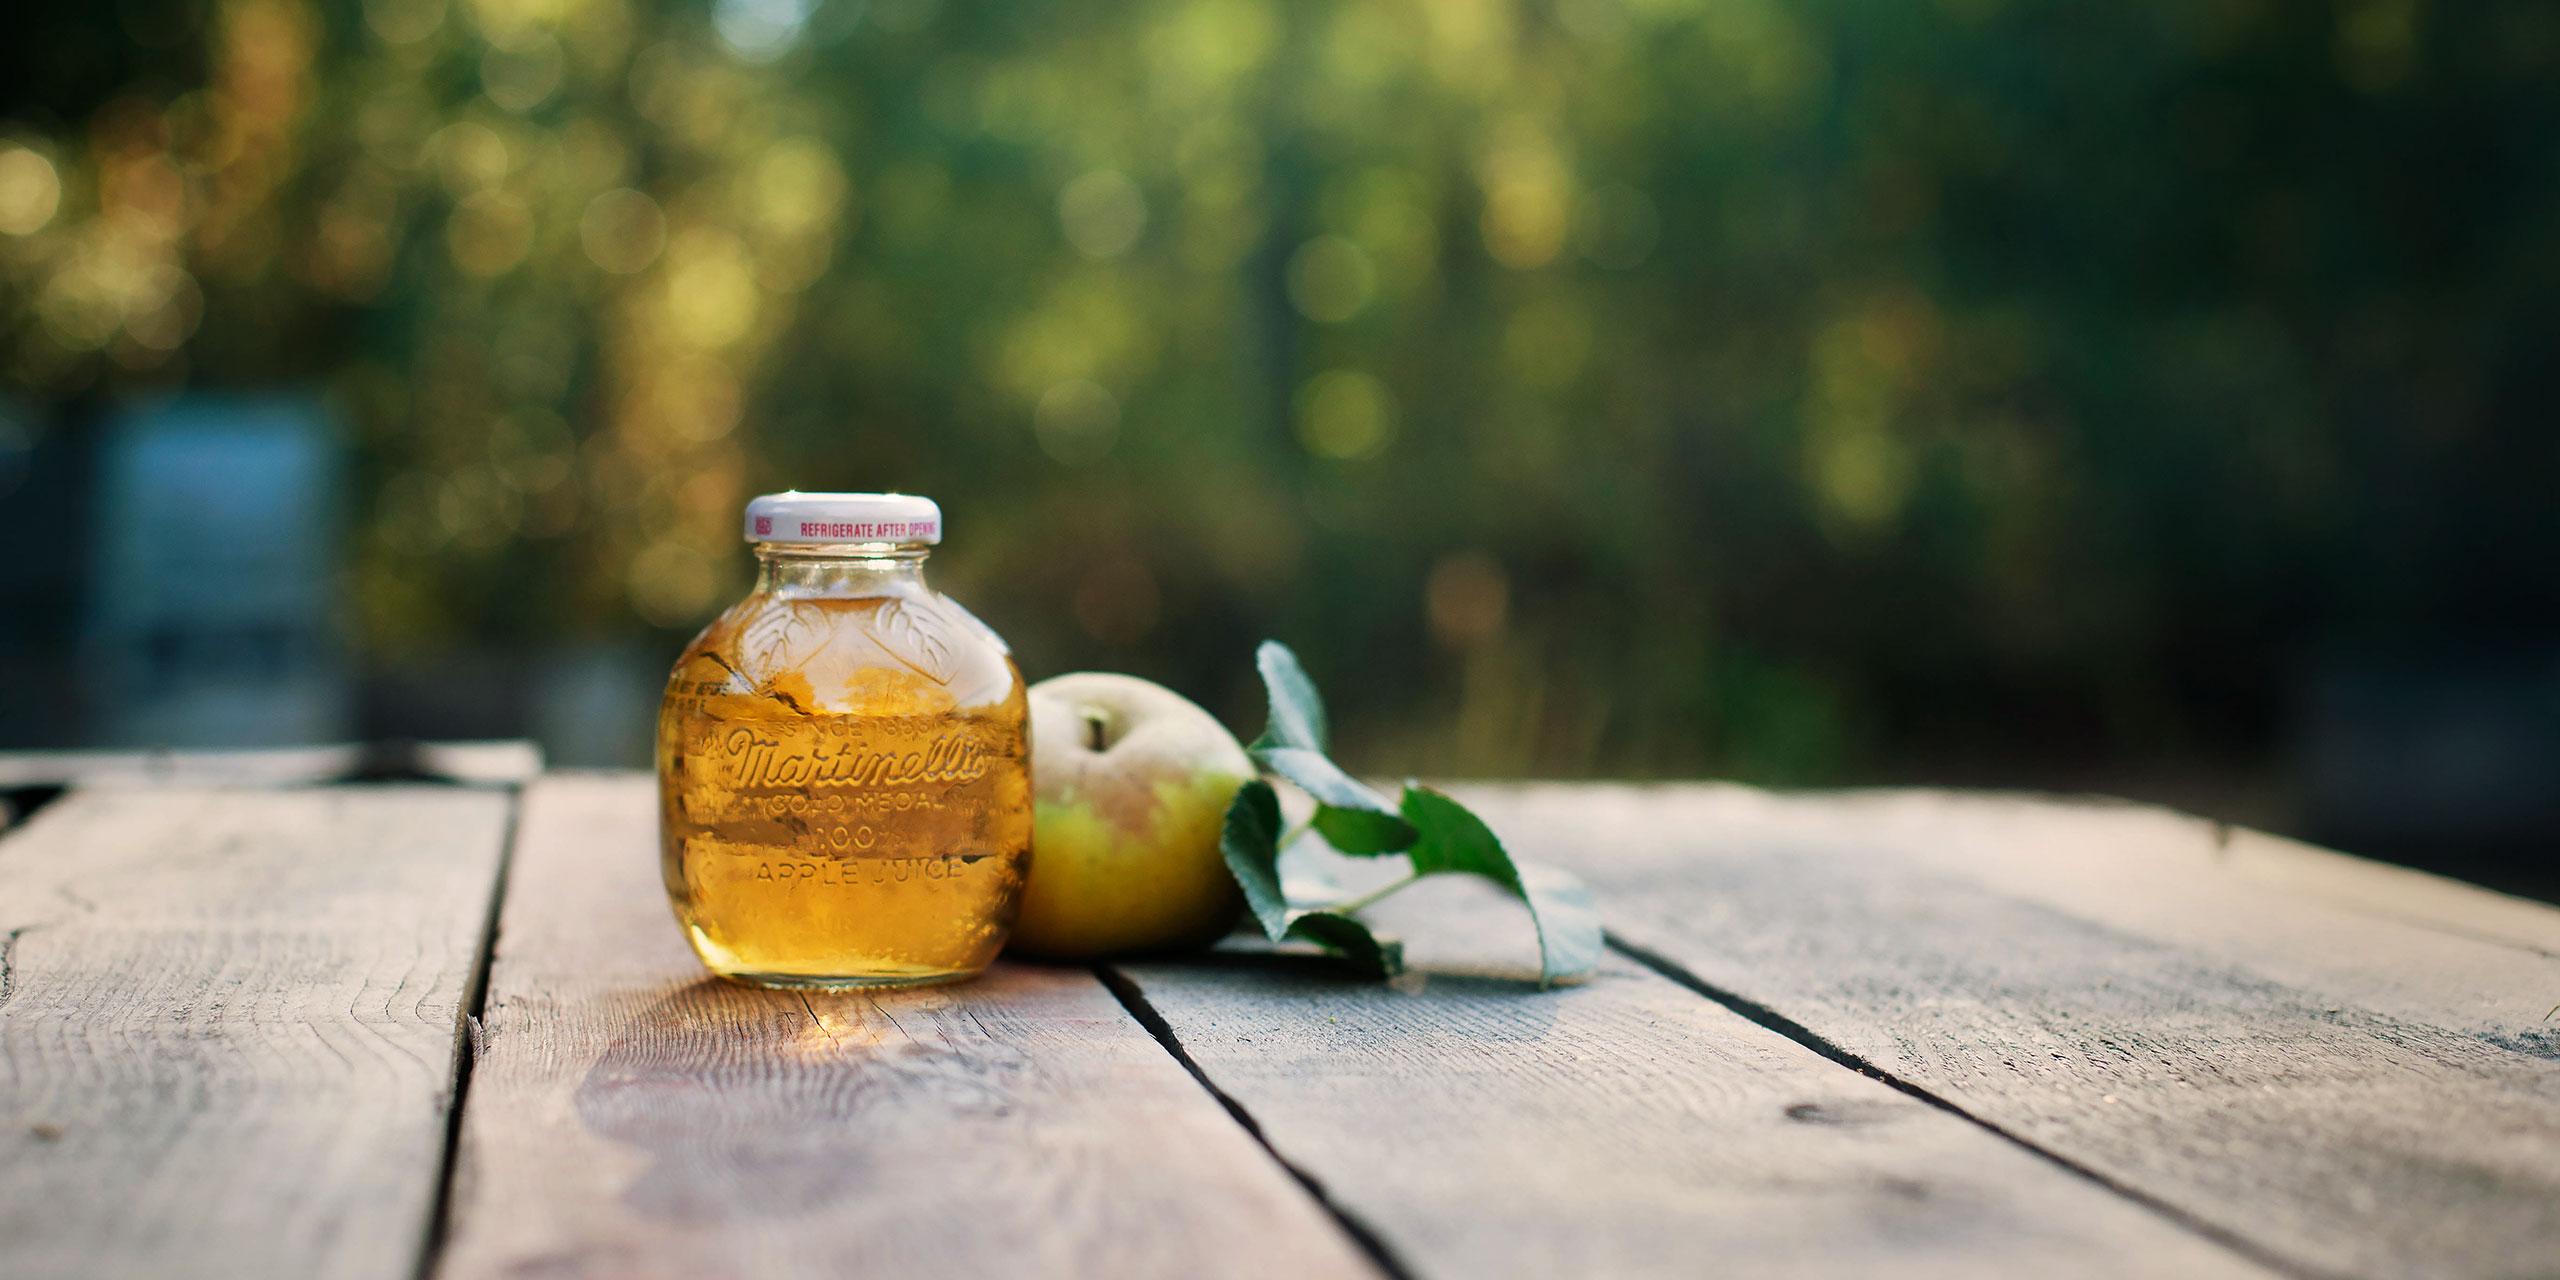 100 Apple Juice 10oz Glass Bottle Still Juices S